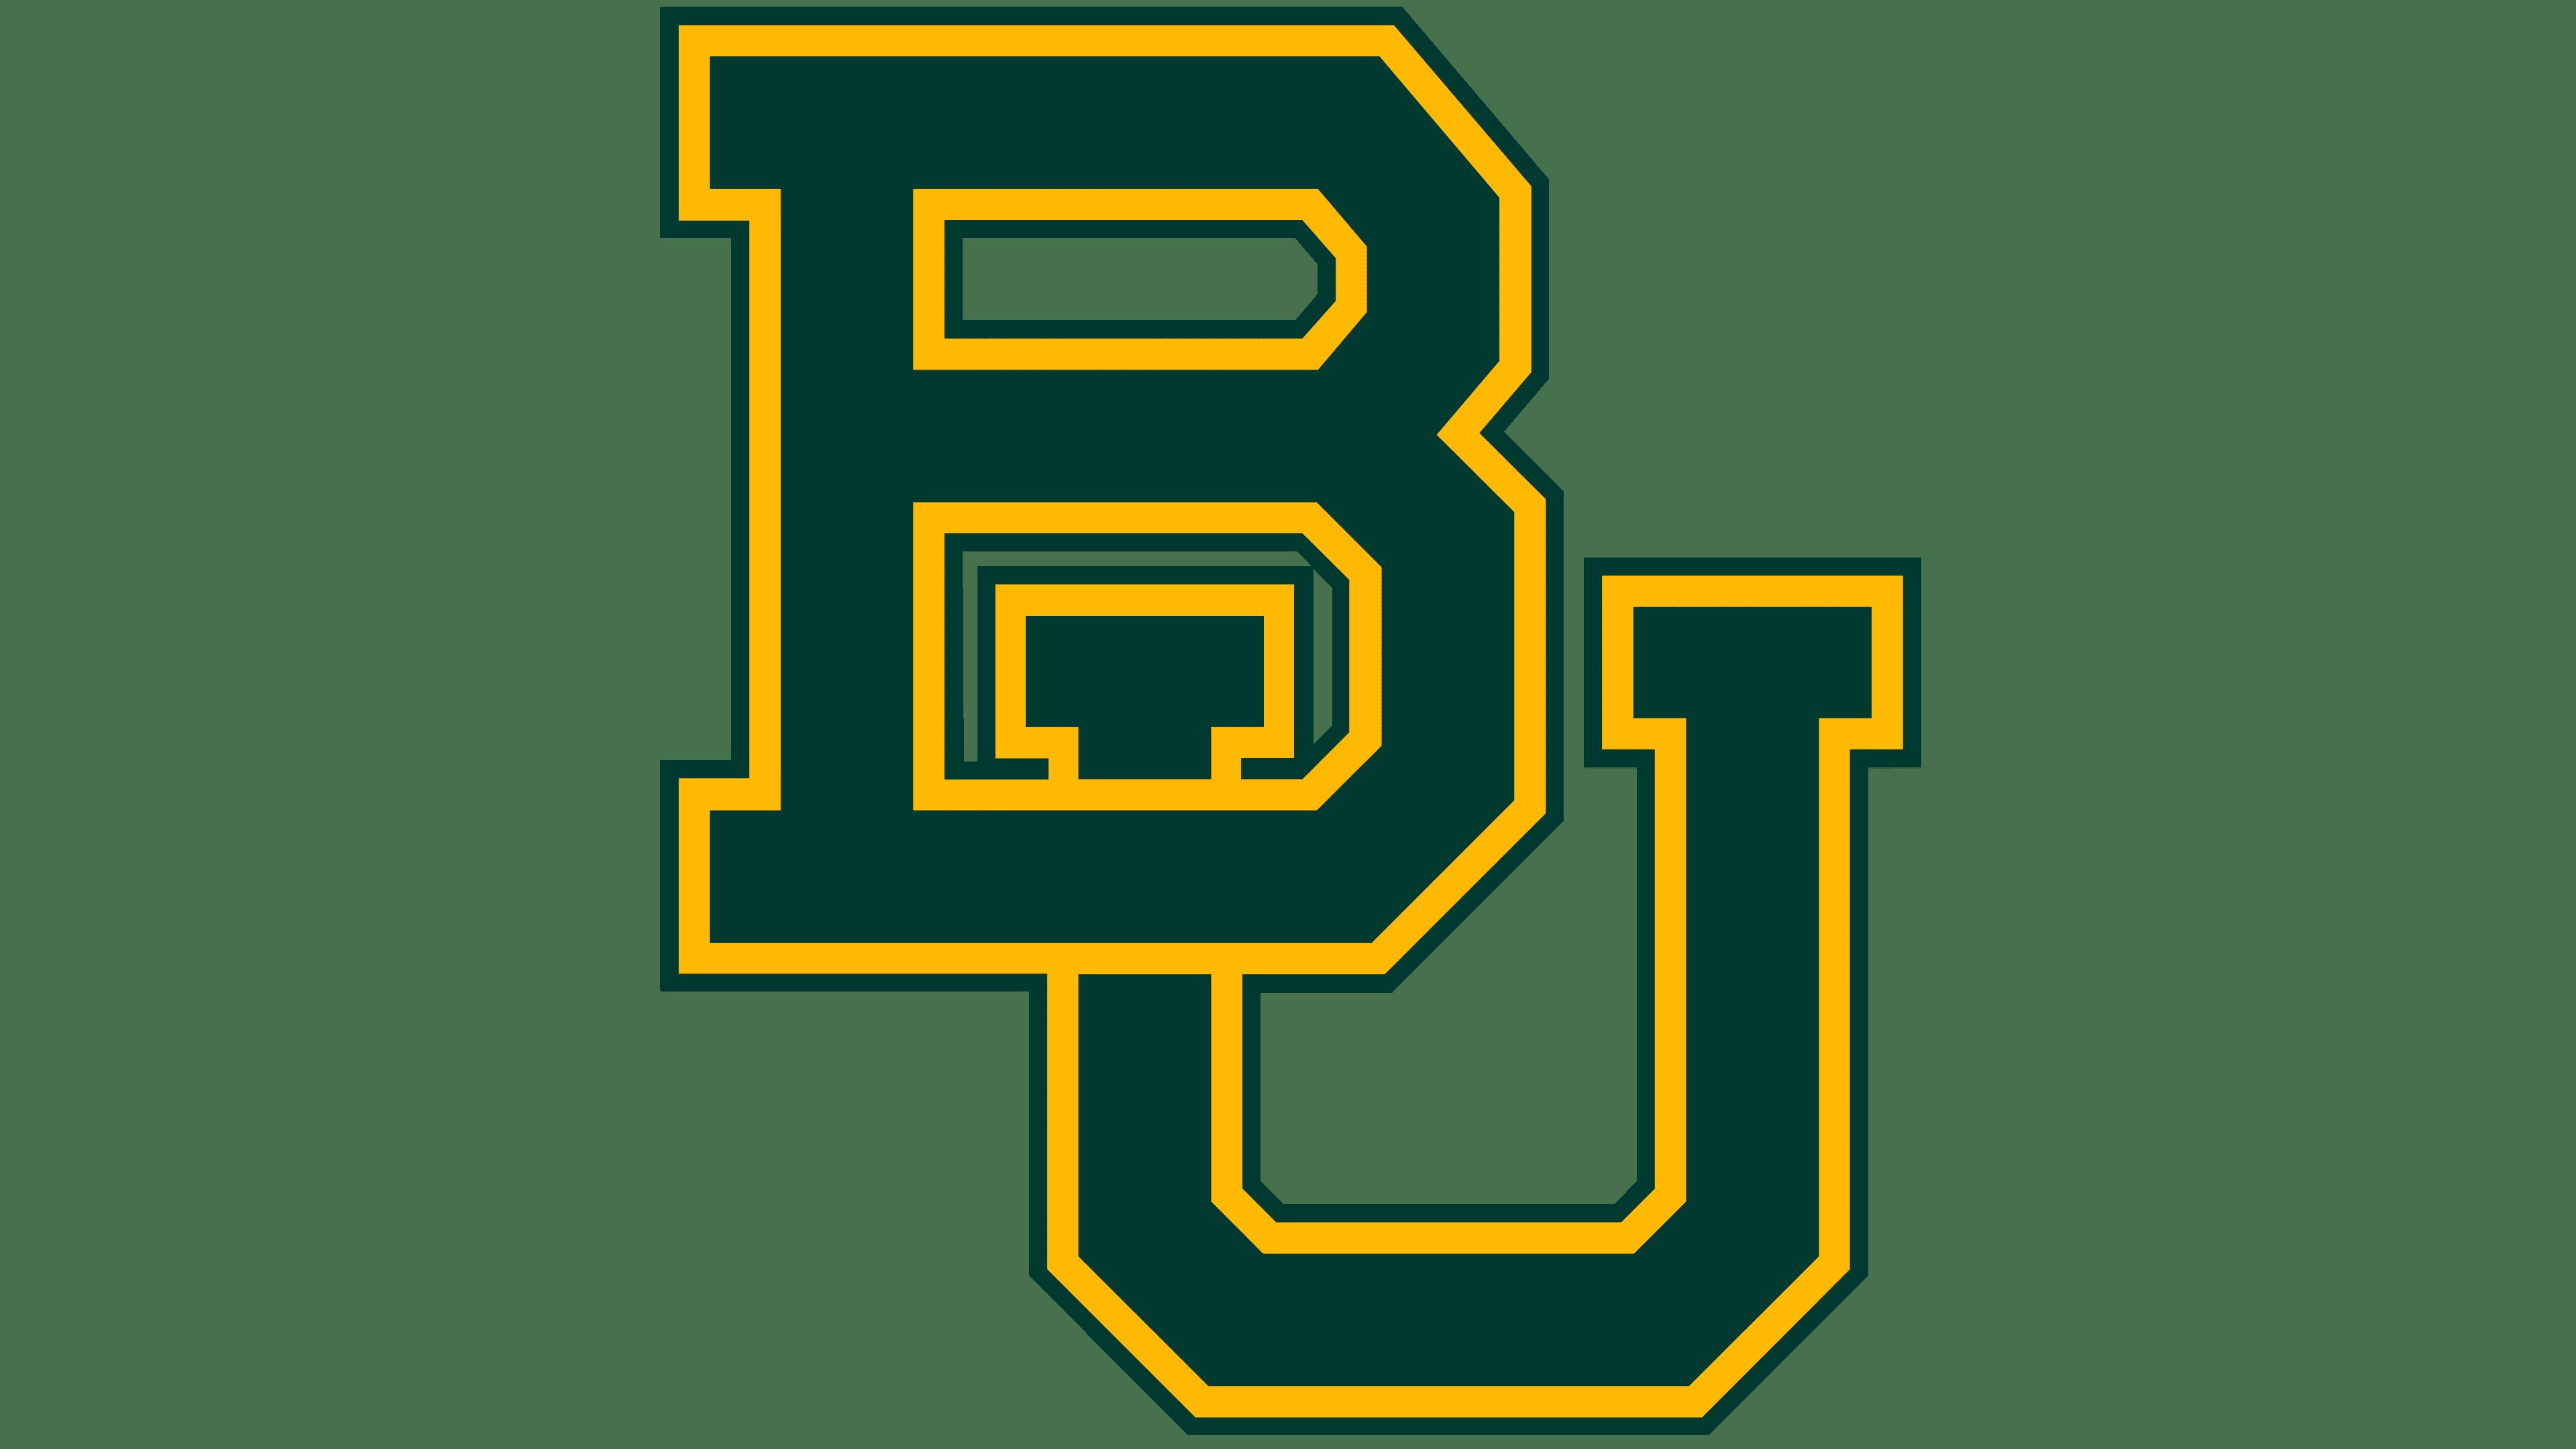 Baylor Bears Logo, PNG, Symbol, History, Meaning